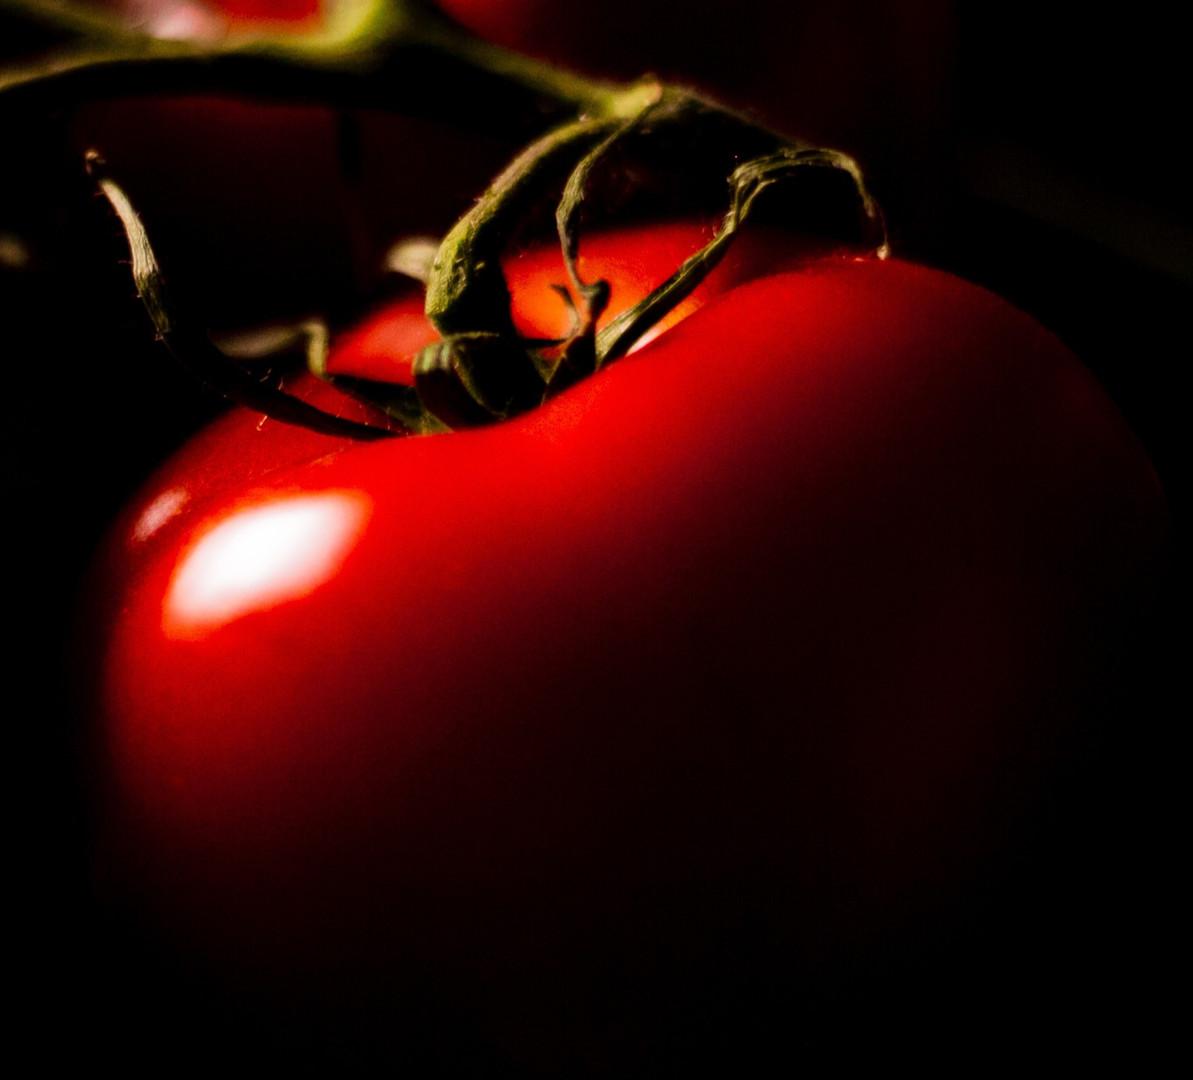 tomato3_edited.jpg